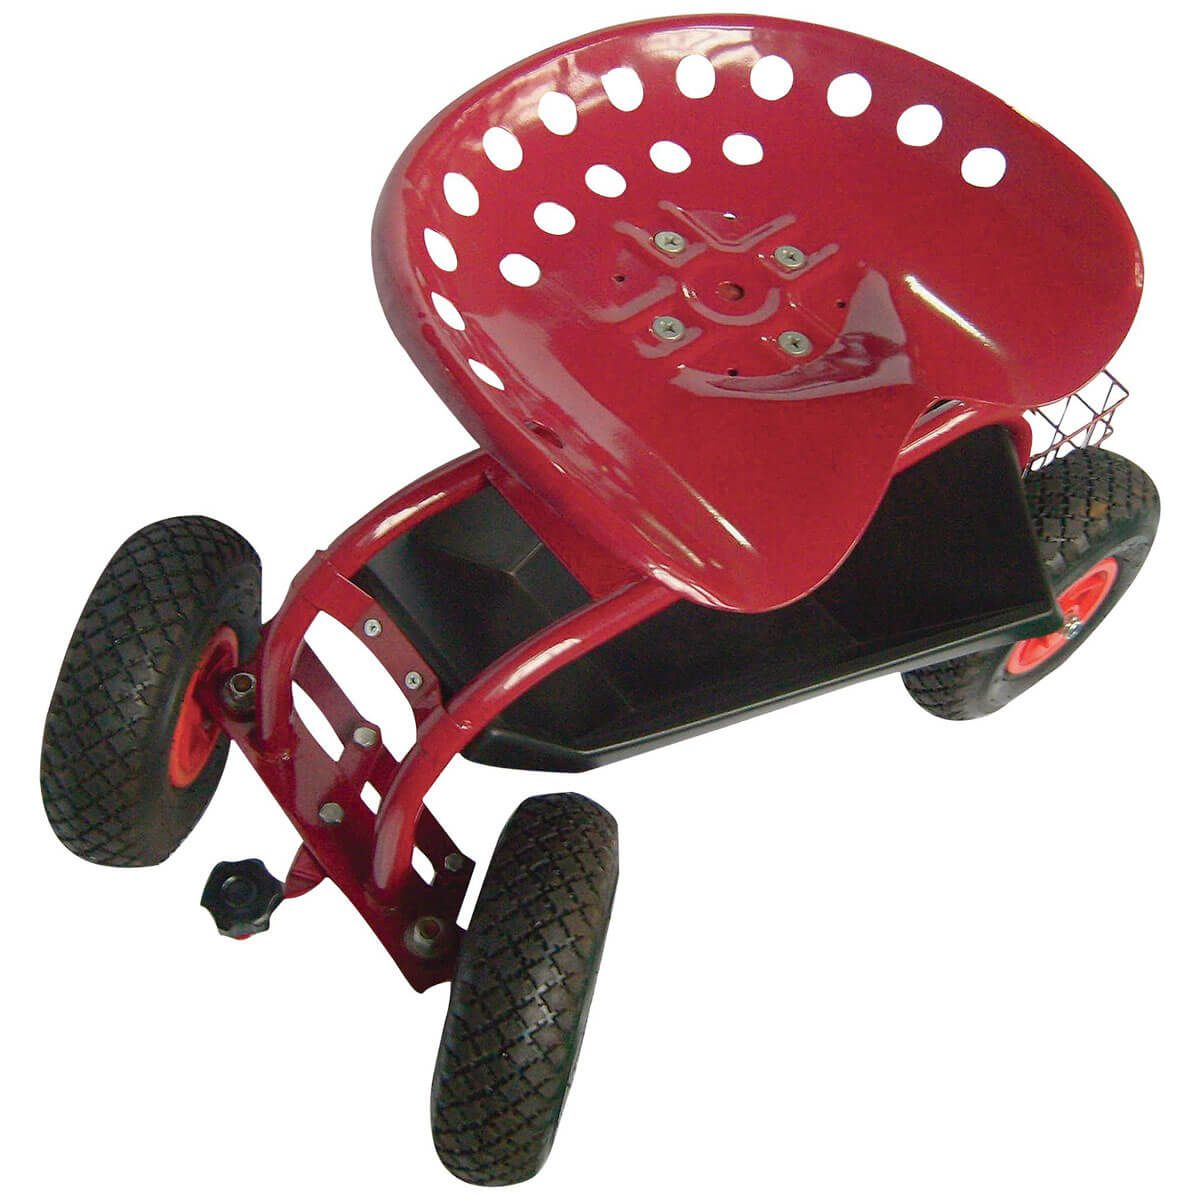 tractor scoot _12 gardening gift idea